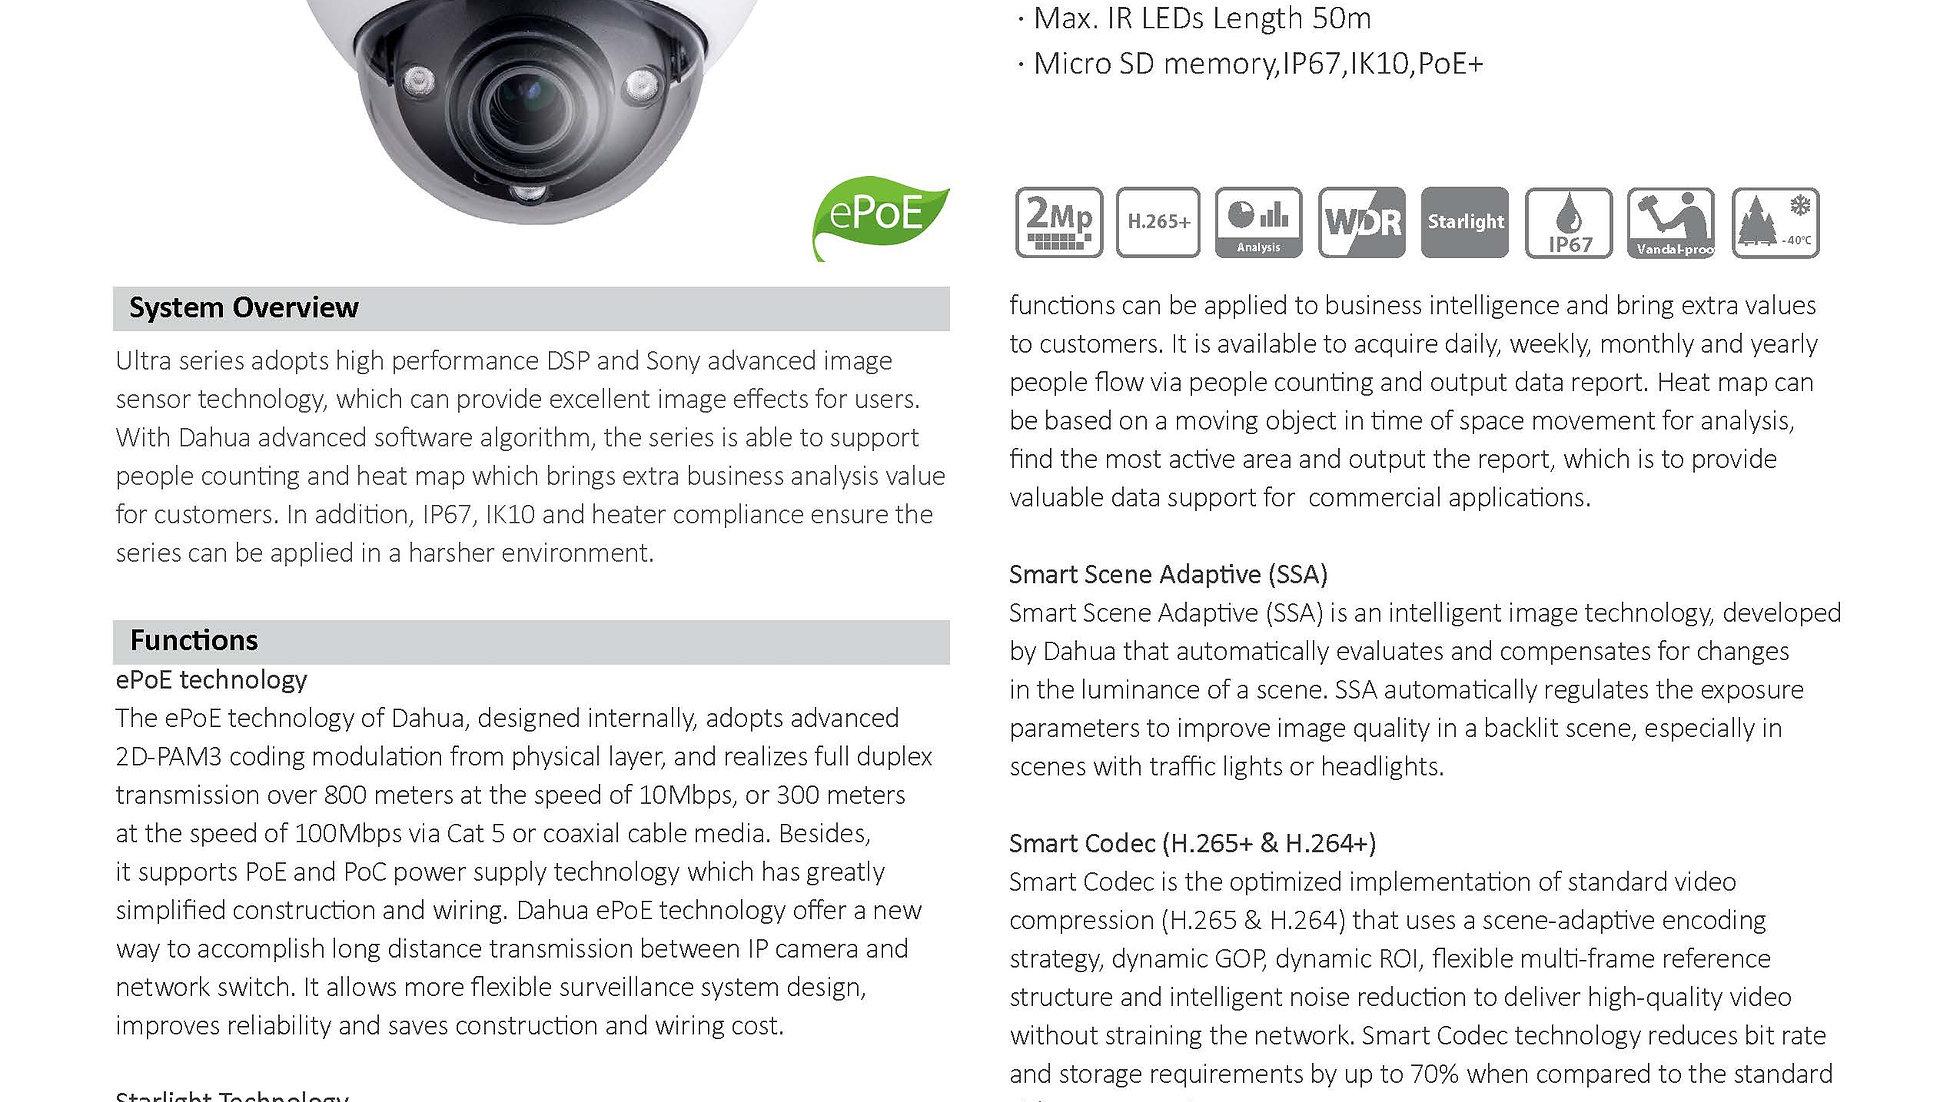 2MP WDR IR Dome Network Camera   mysite